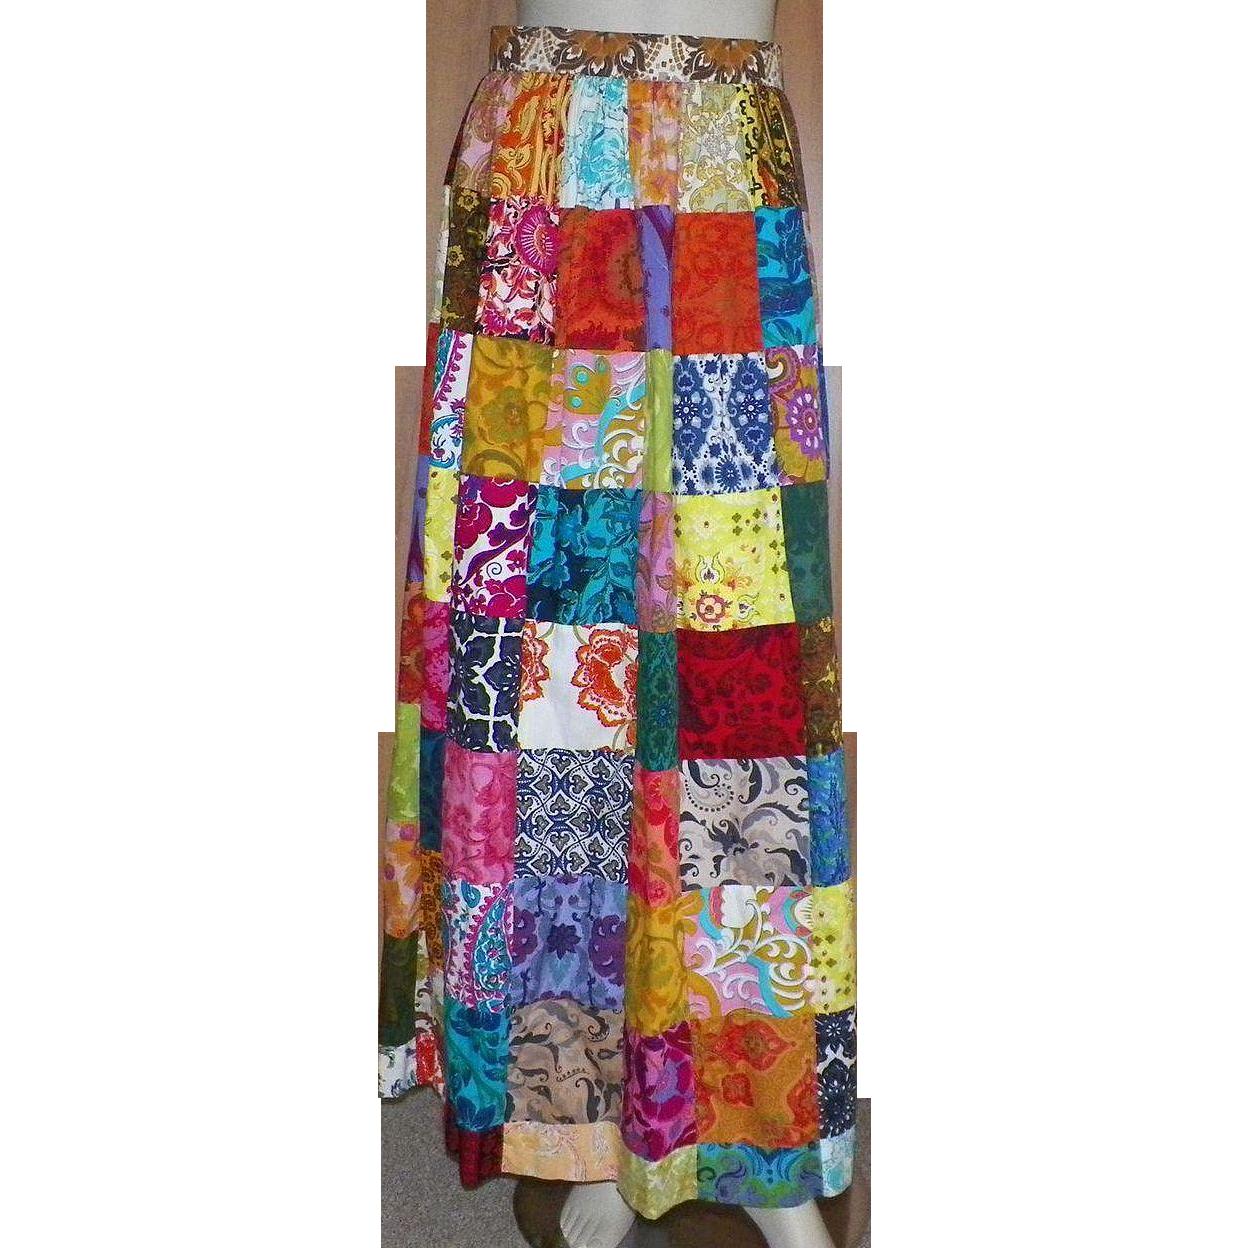 Vintage 1970's Thai Cotton Patchwork Maxi Skirt